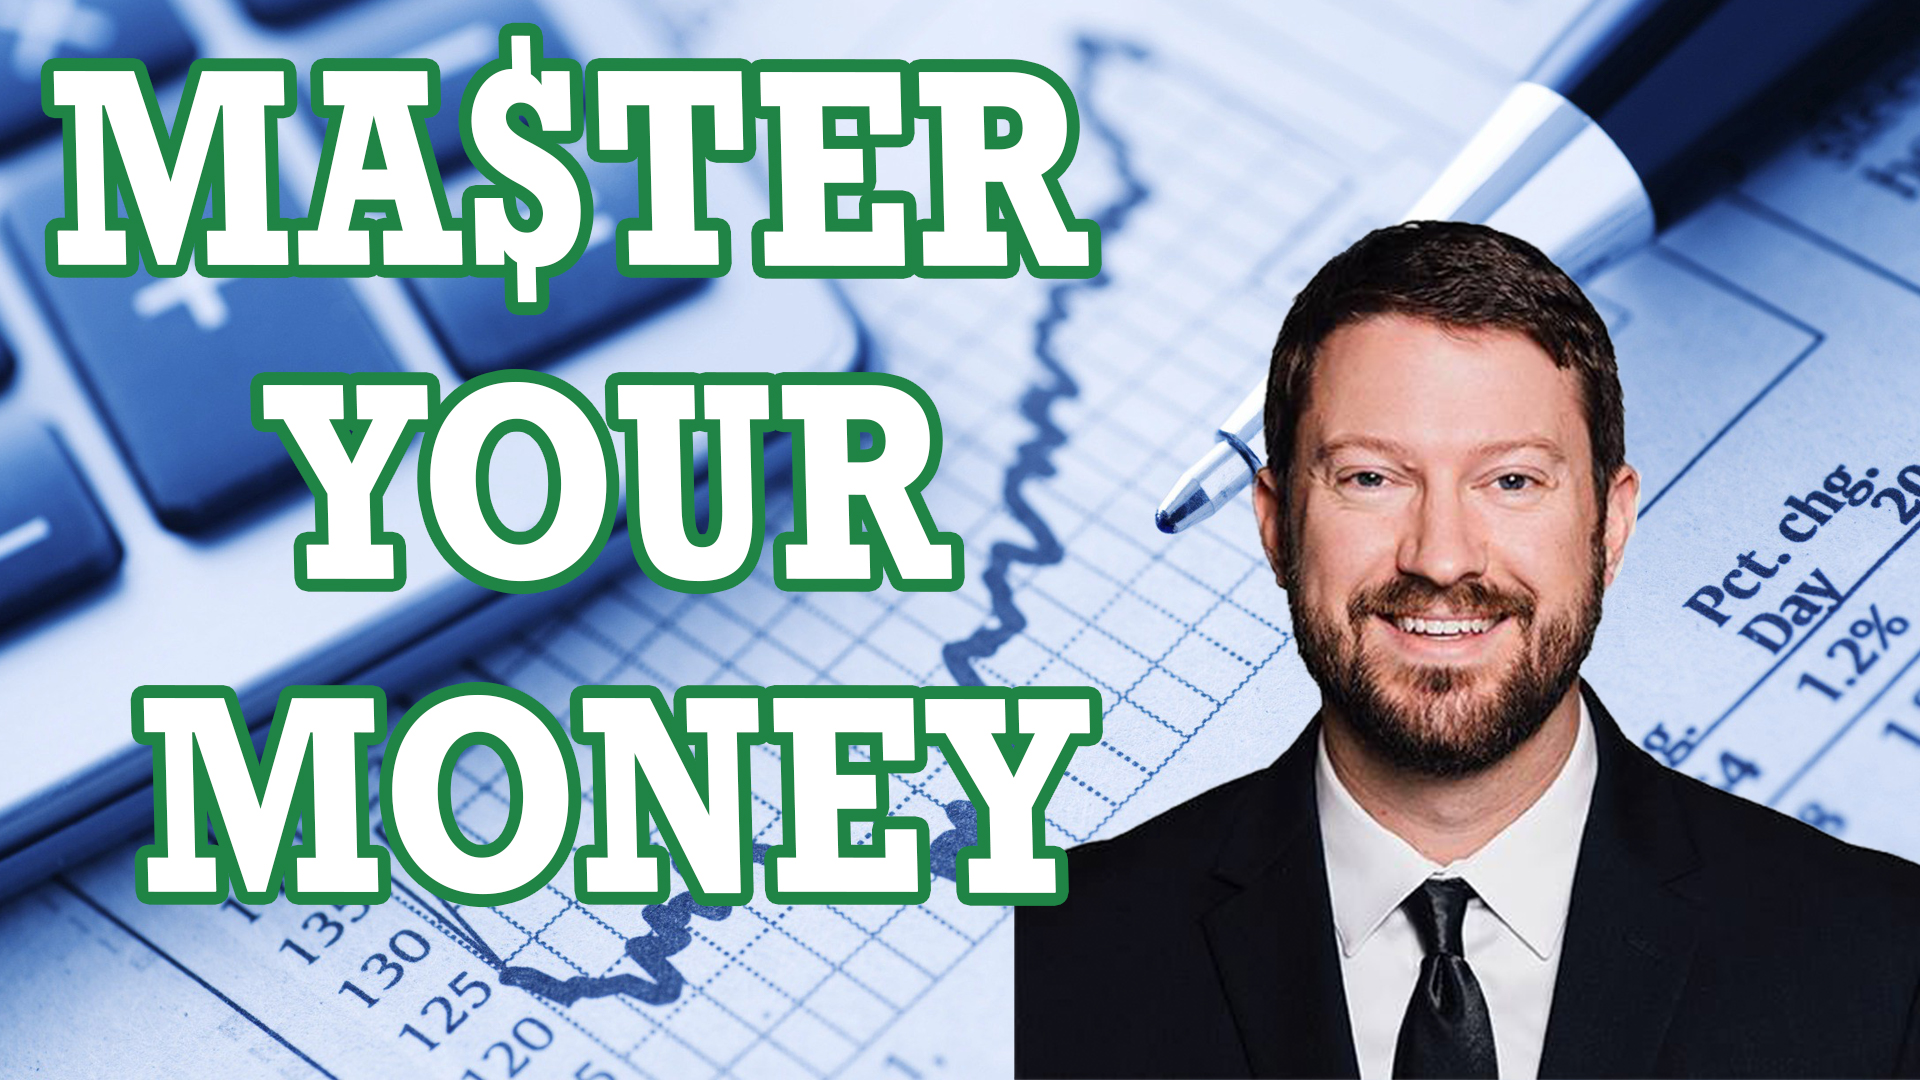 MASTER YOUR MONEY WITH KEITH PRESCOTT | AREN 119